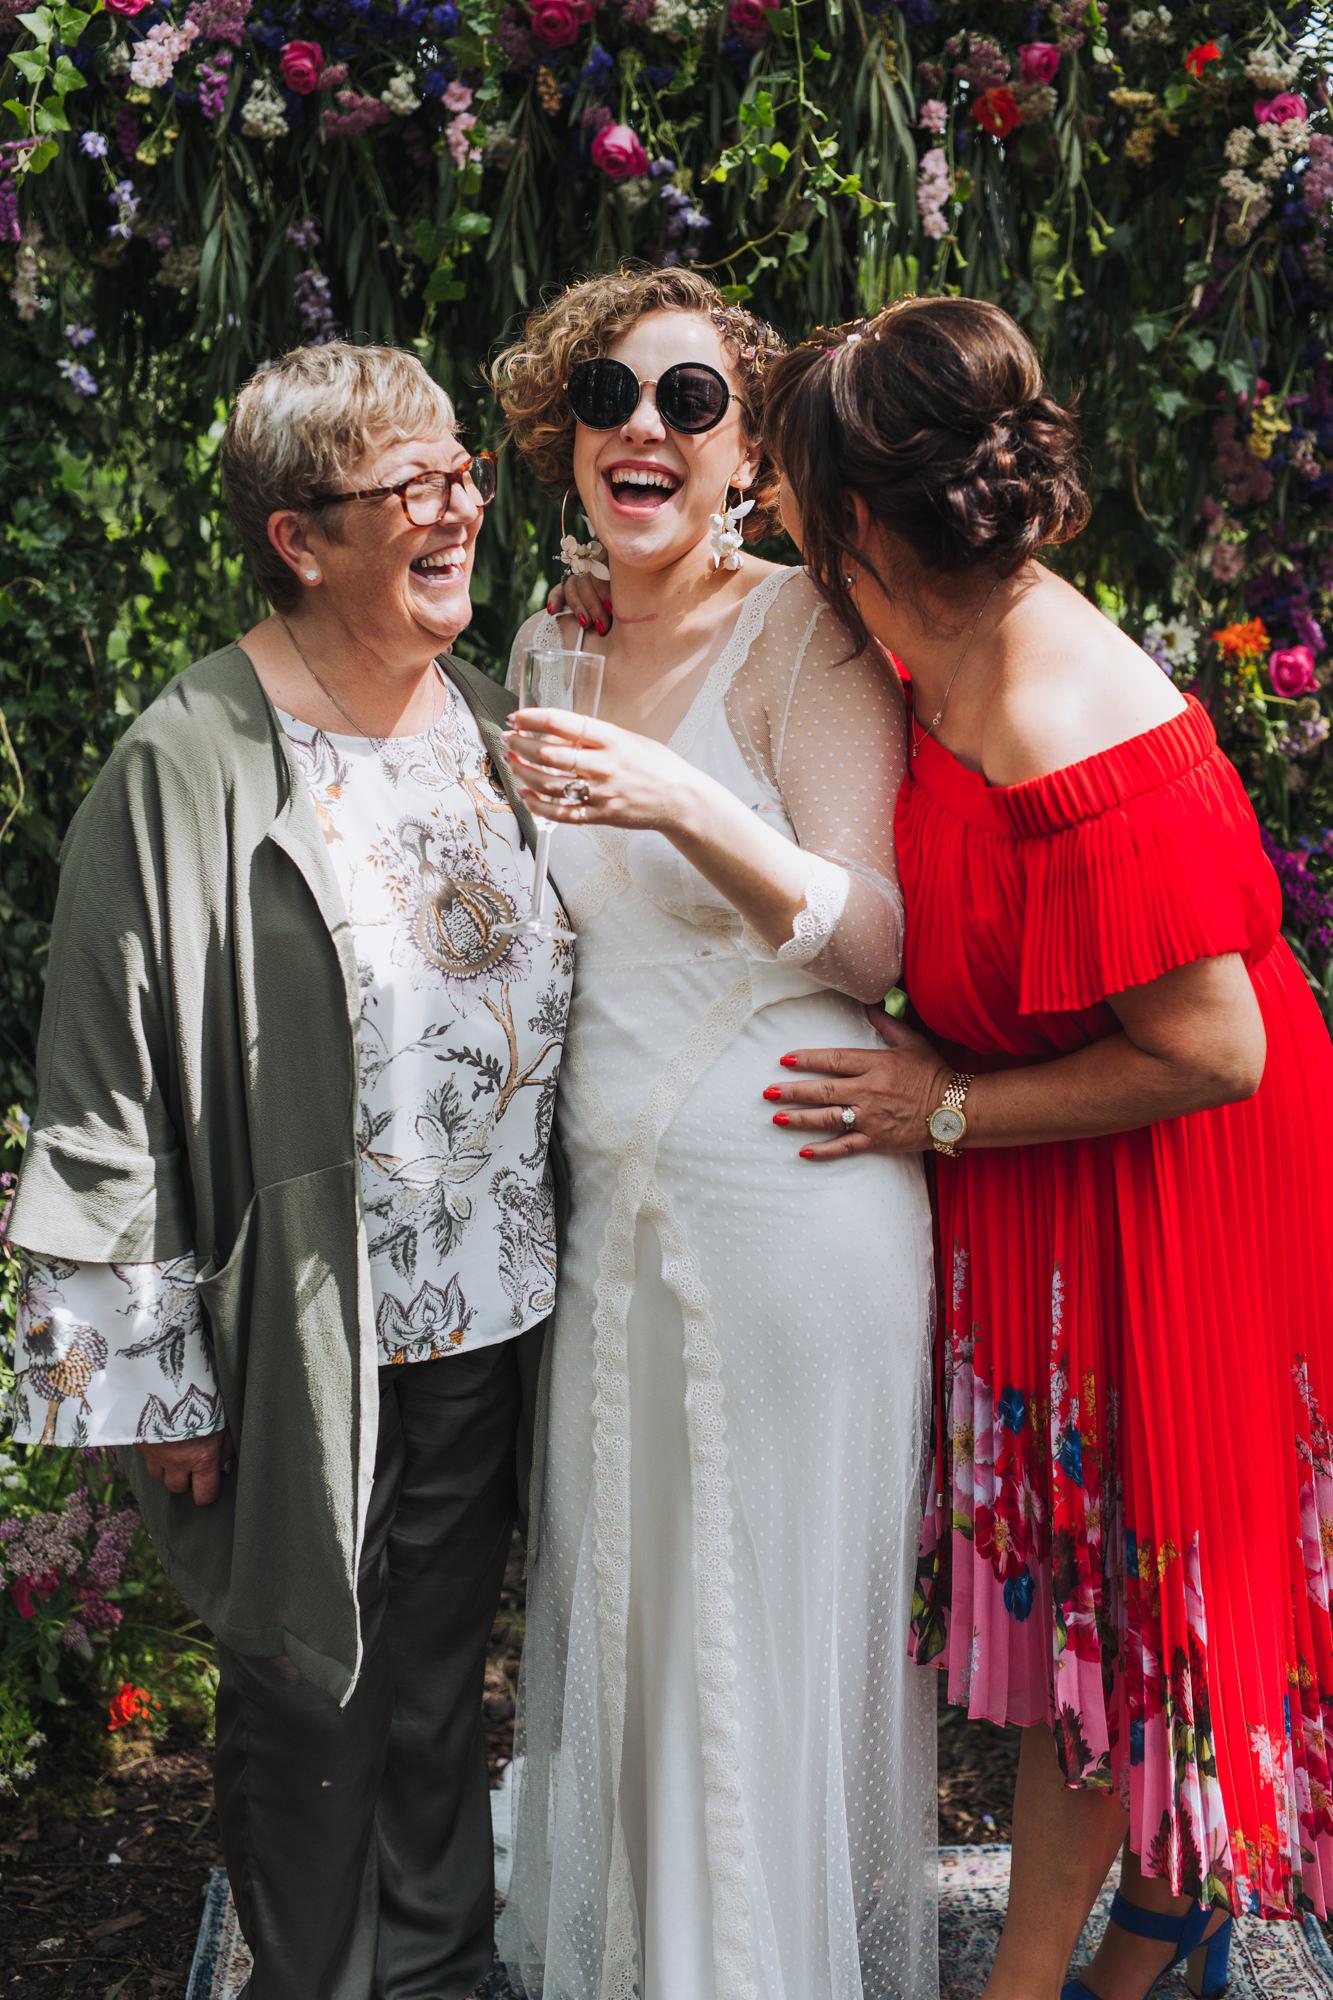 applewood wedding photographer leeds, yorkshire44.jpg